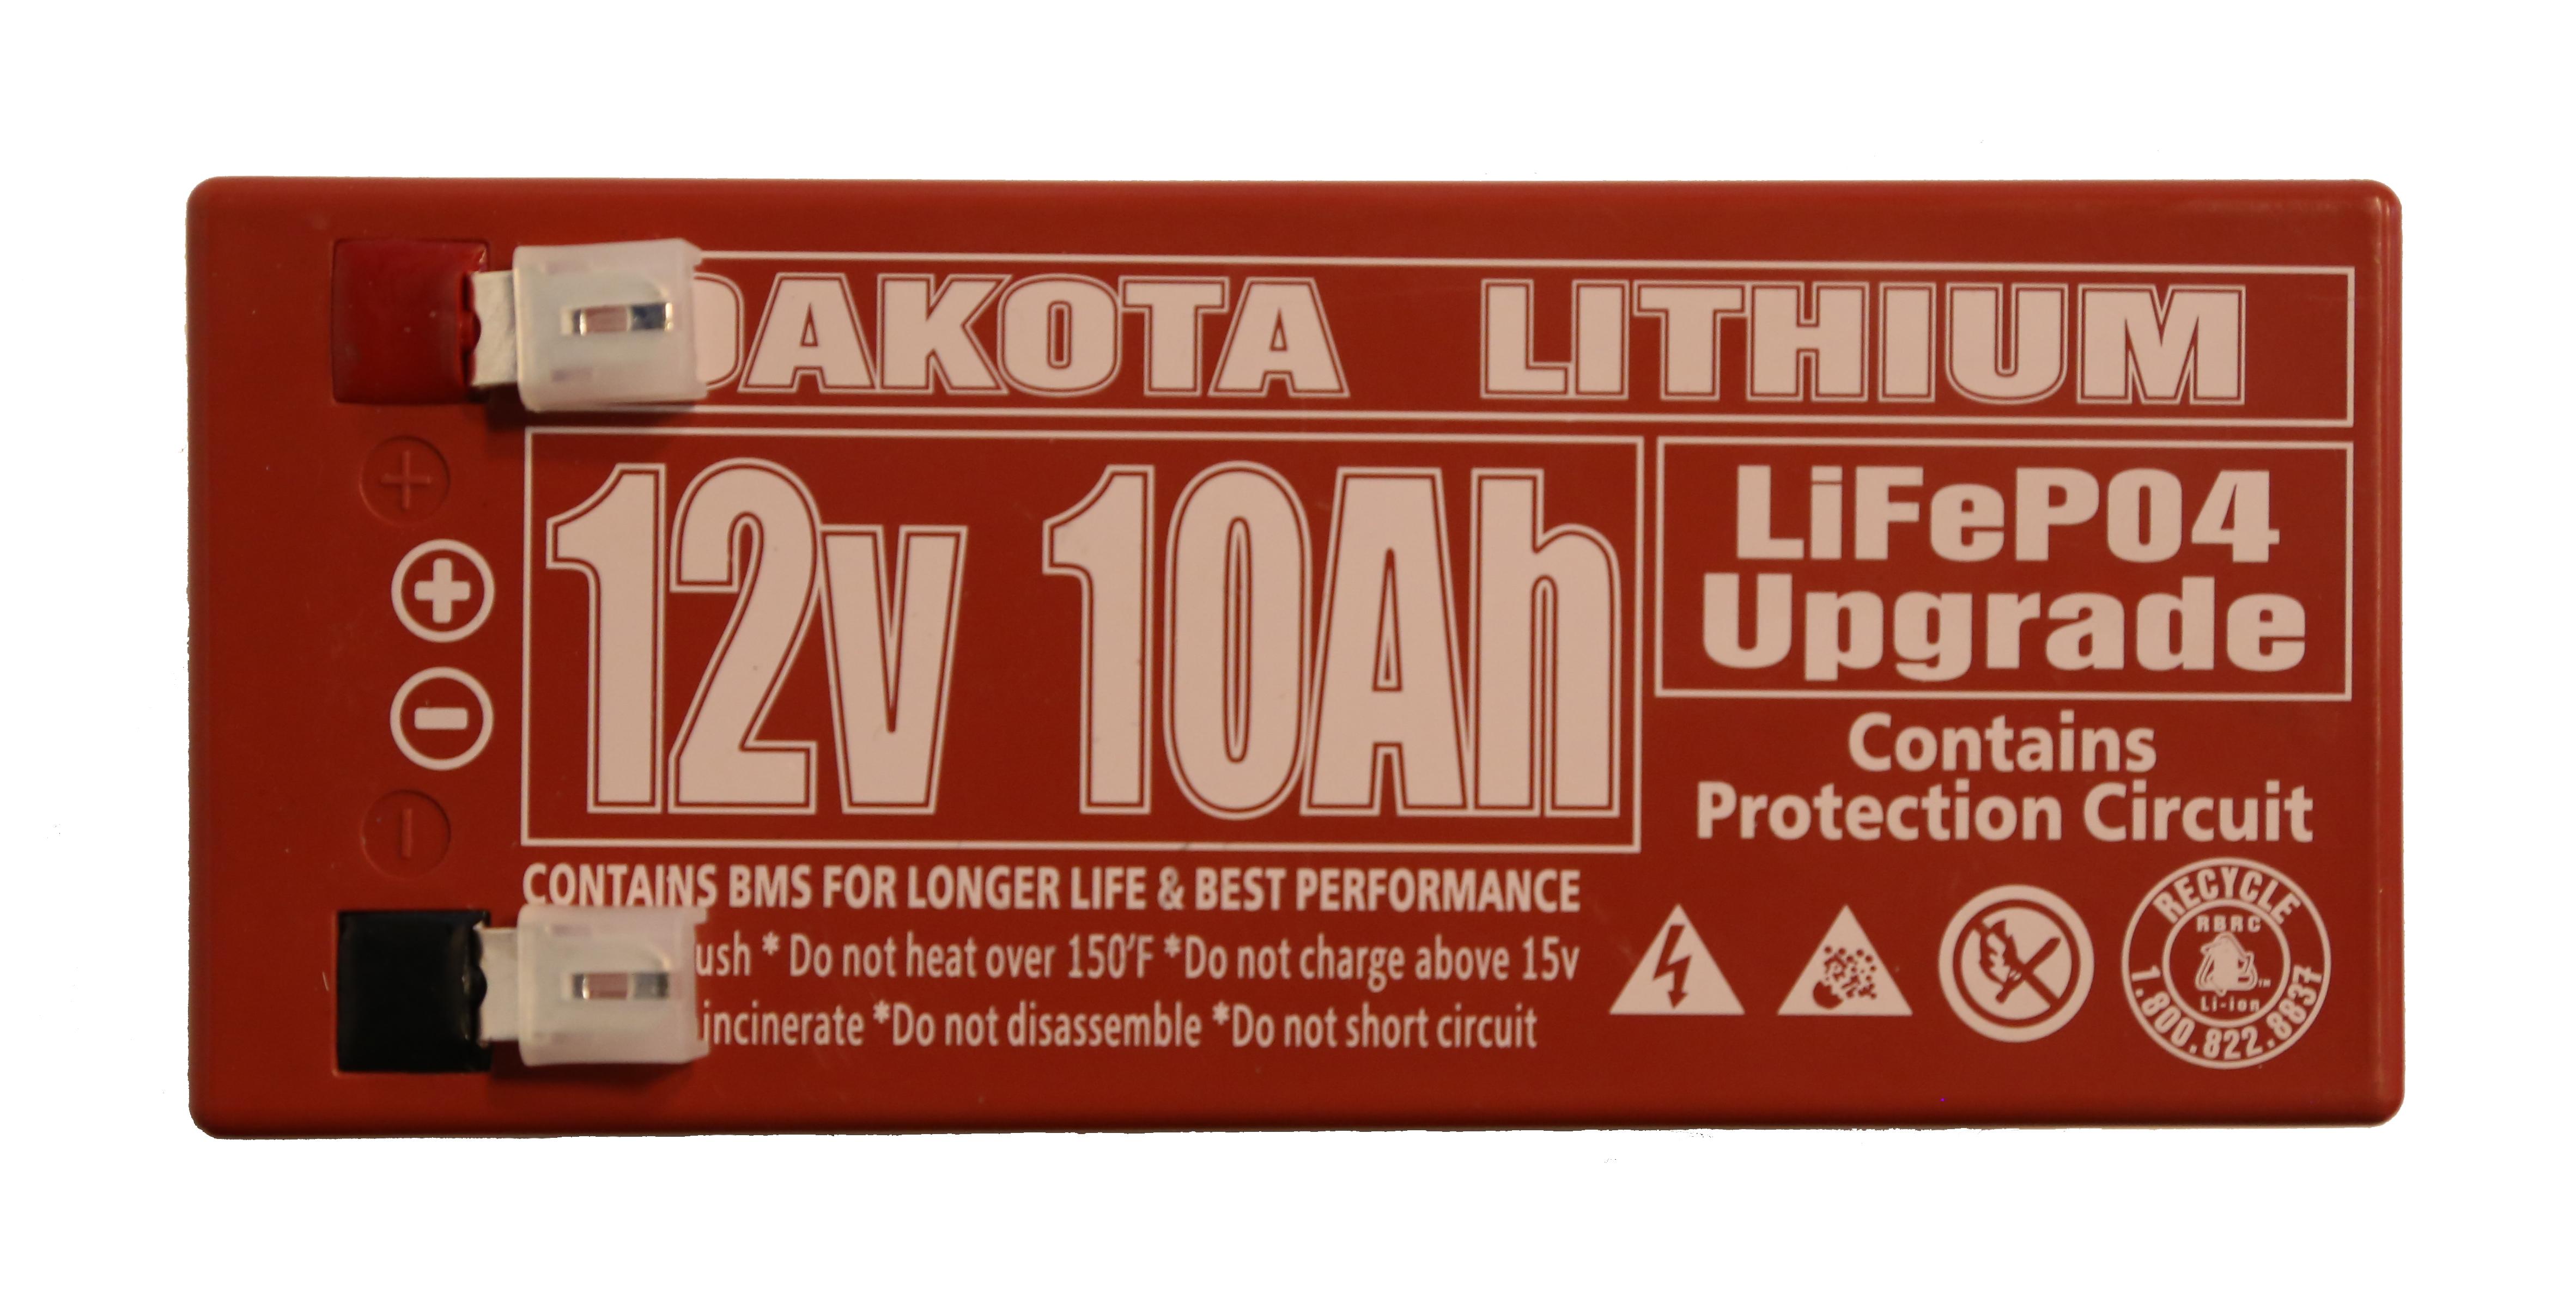 12 V Dakota Lithium Battery 10 Ah Lifepo4 Short Circuit Protection Buy Top Copy